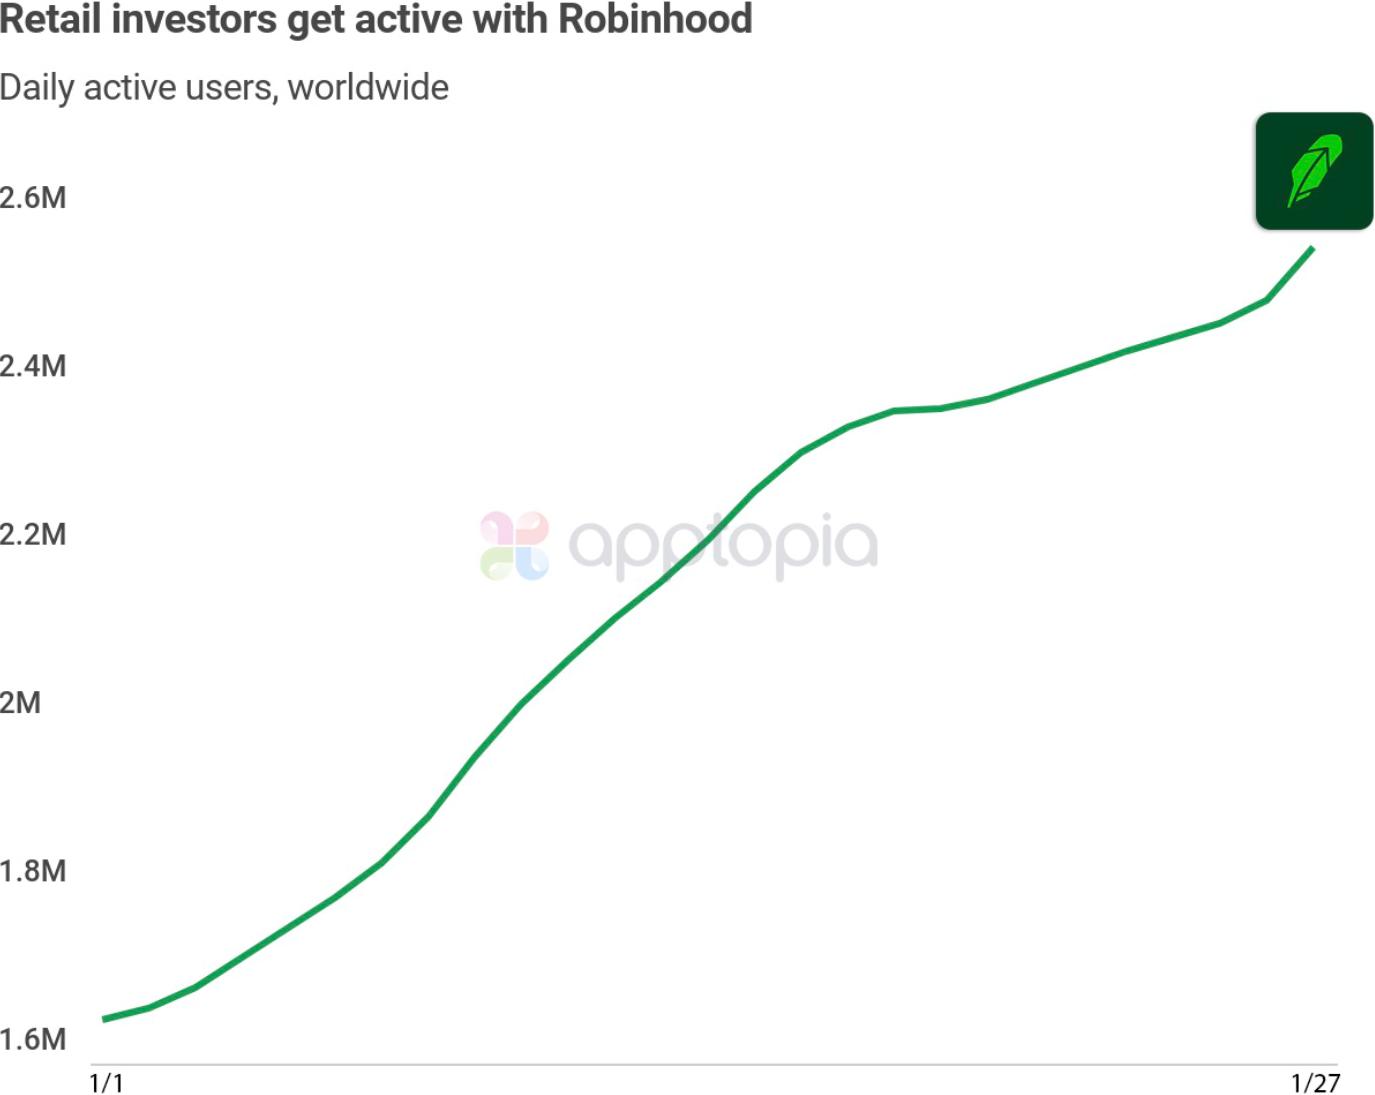 RobinHood Growth